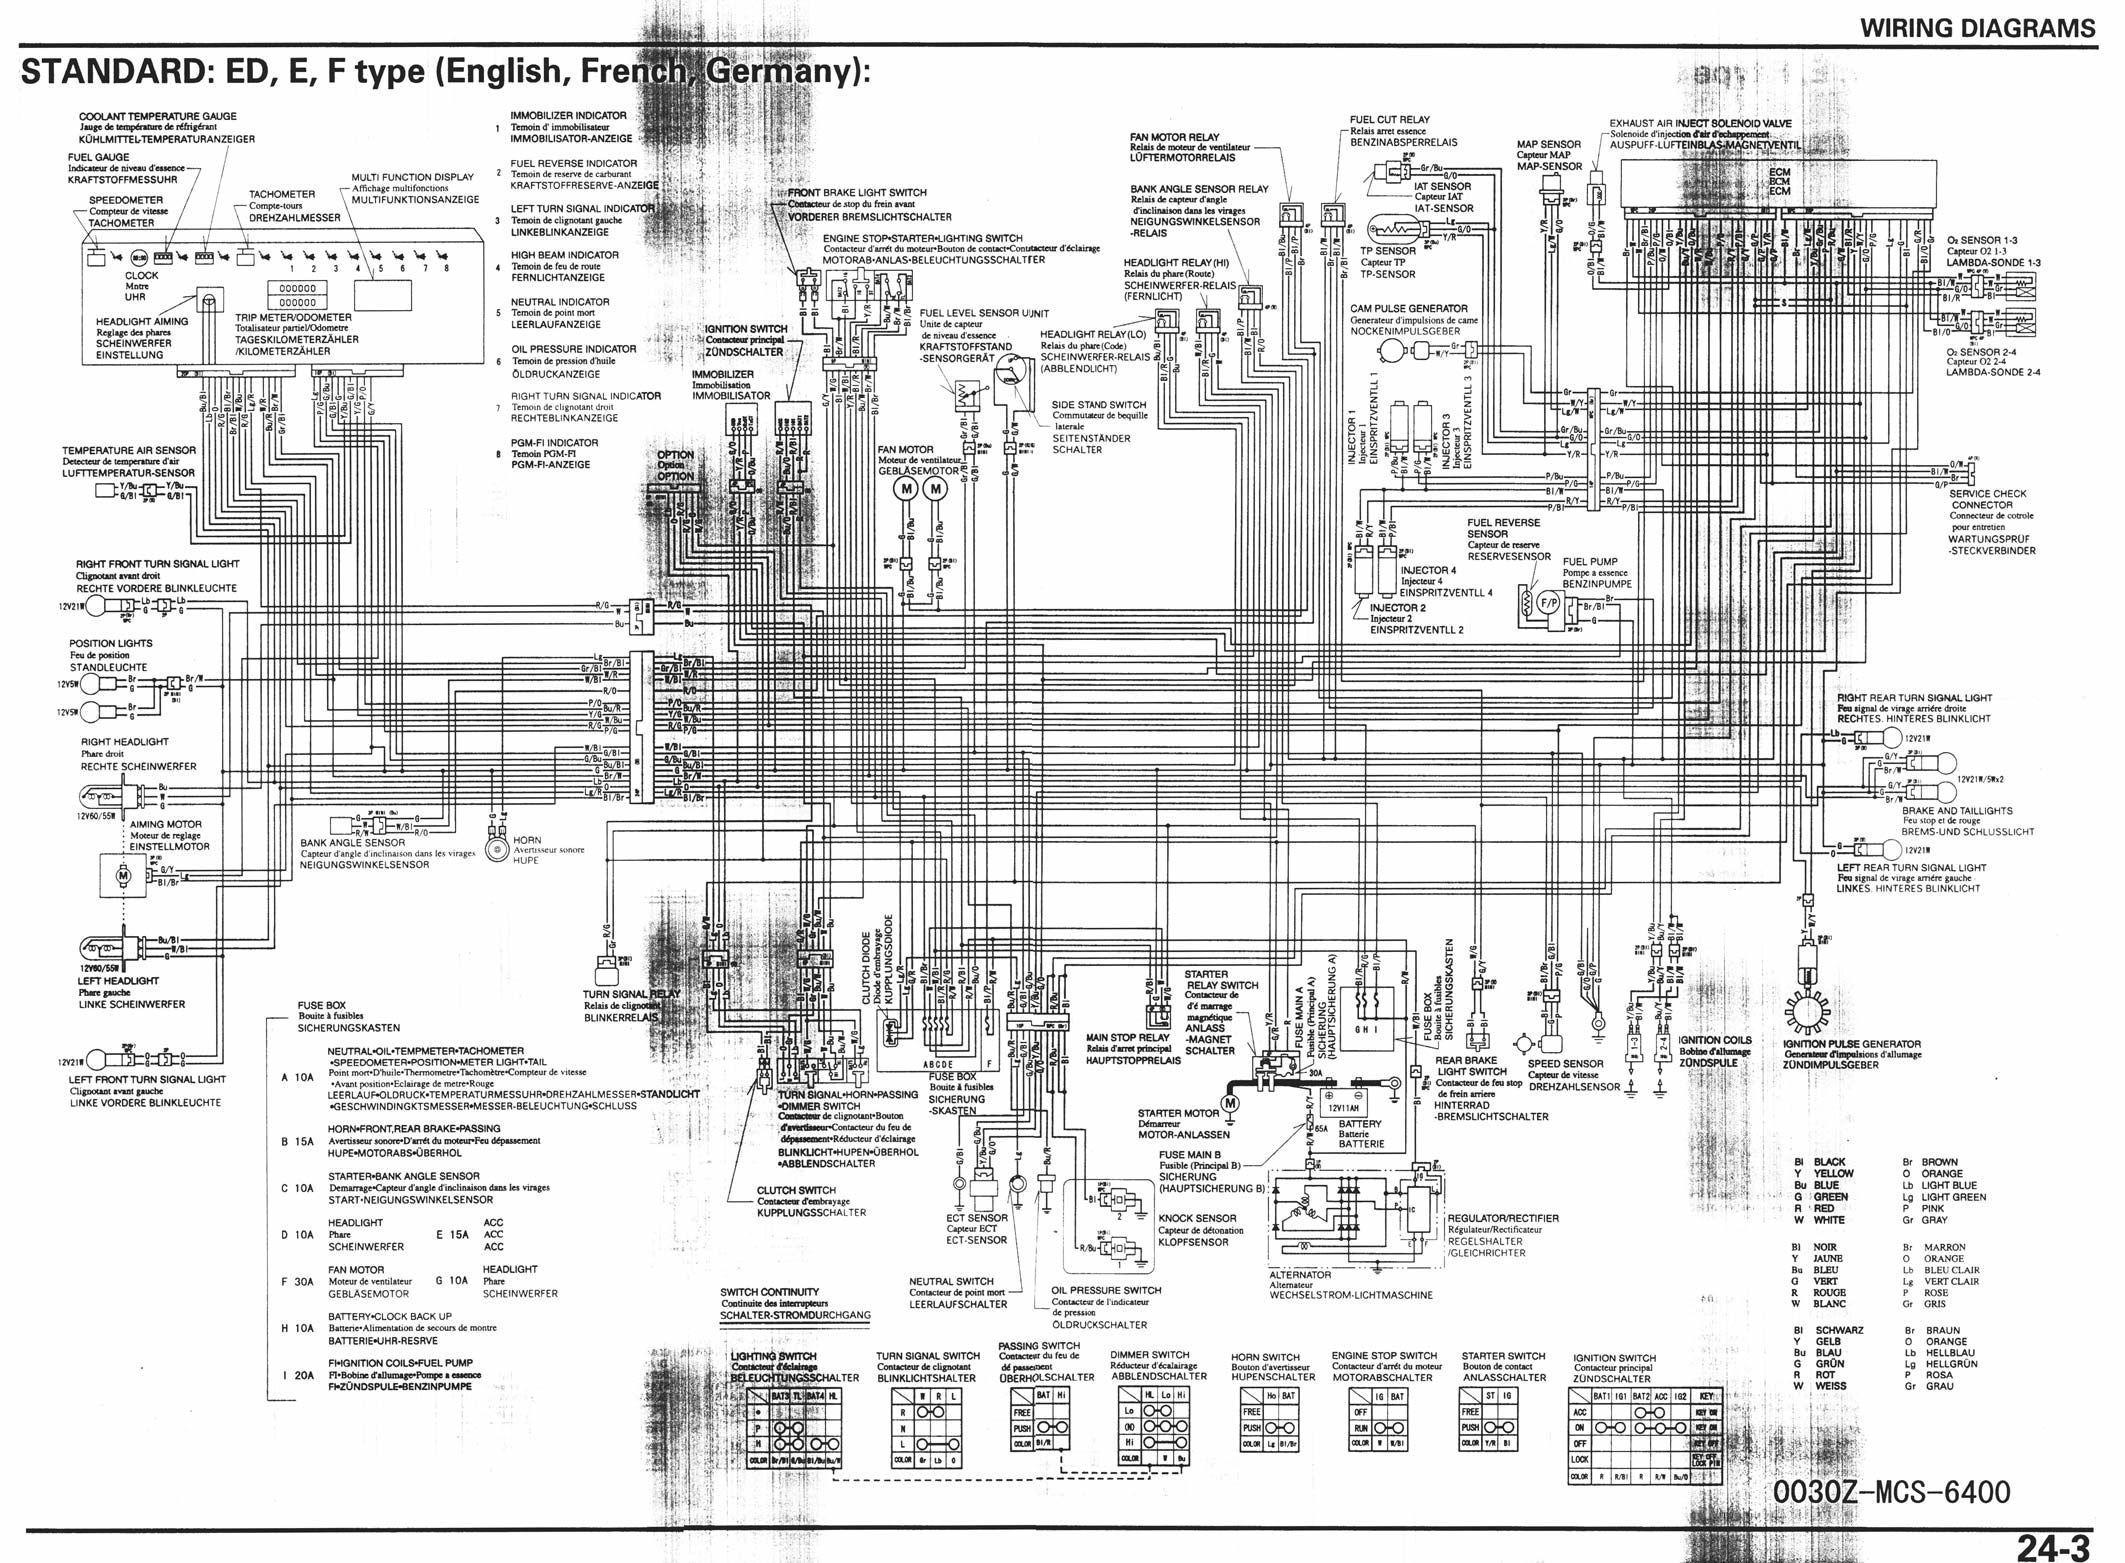 Bmw F650gs Wiring Diagram in 2020 | Electrical wiring diagram, Bmw e46, BmwPinterest